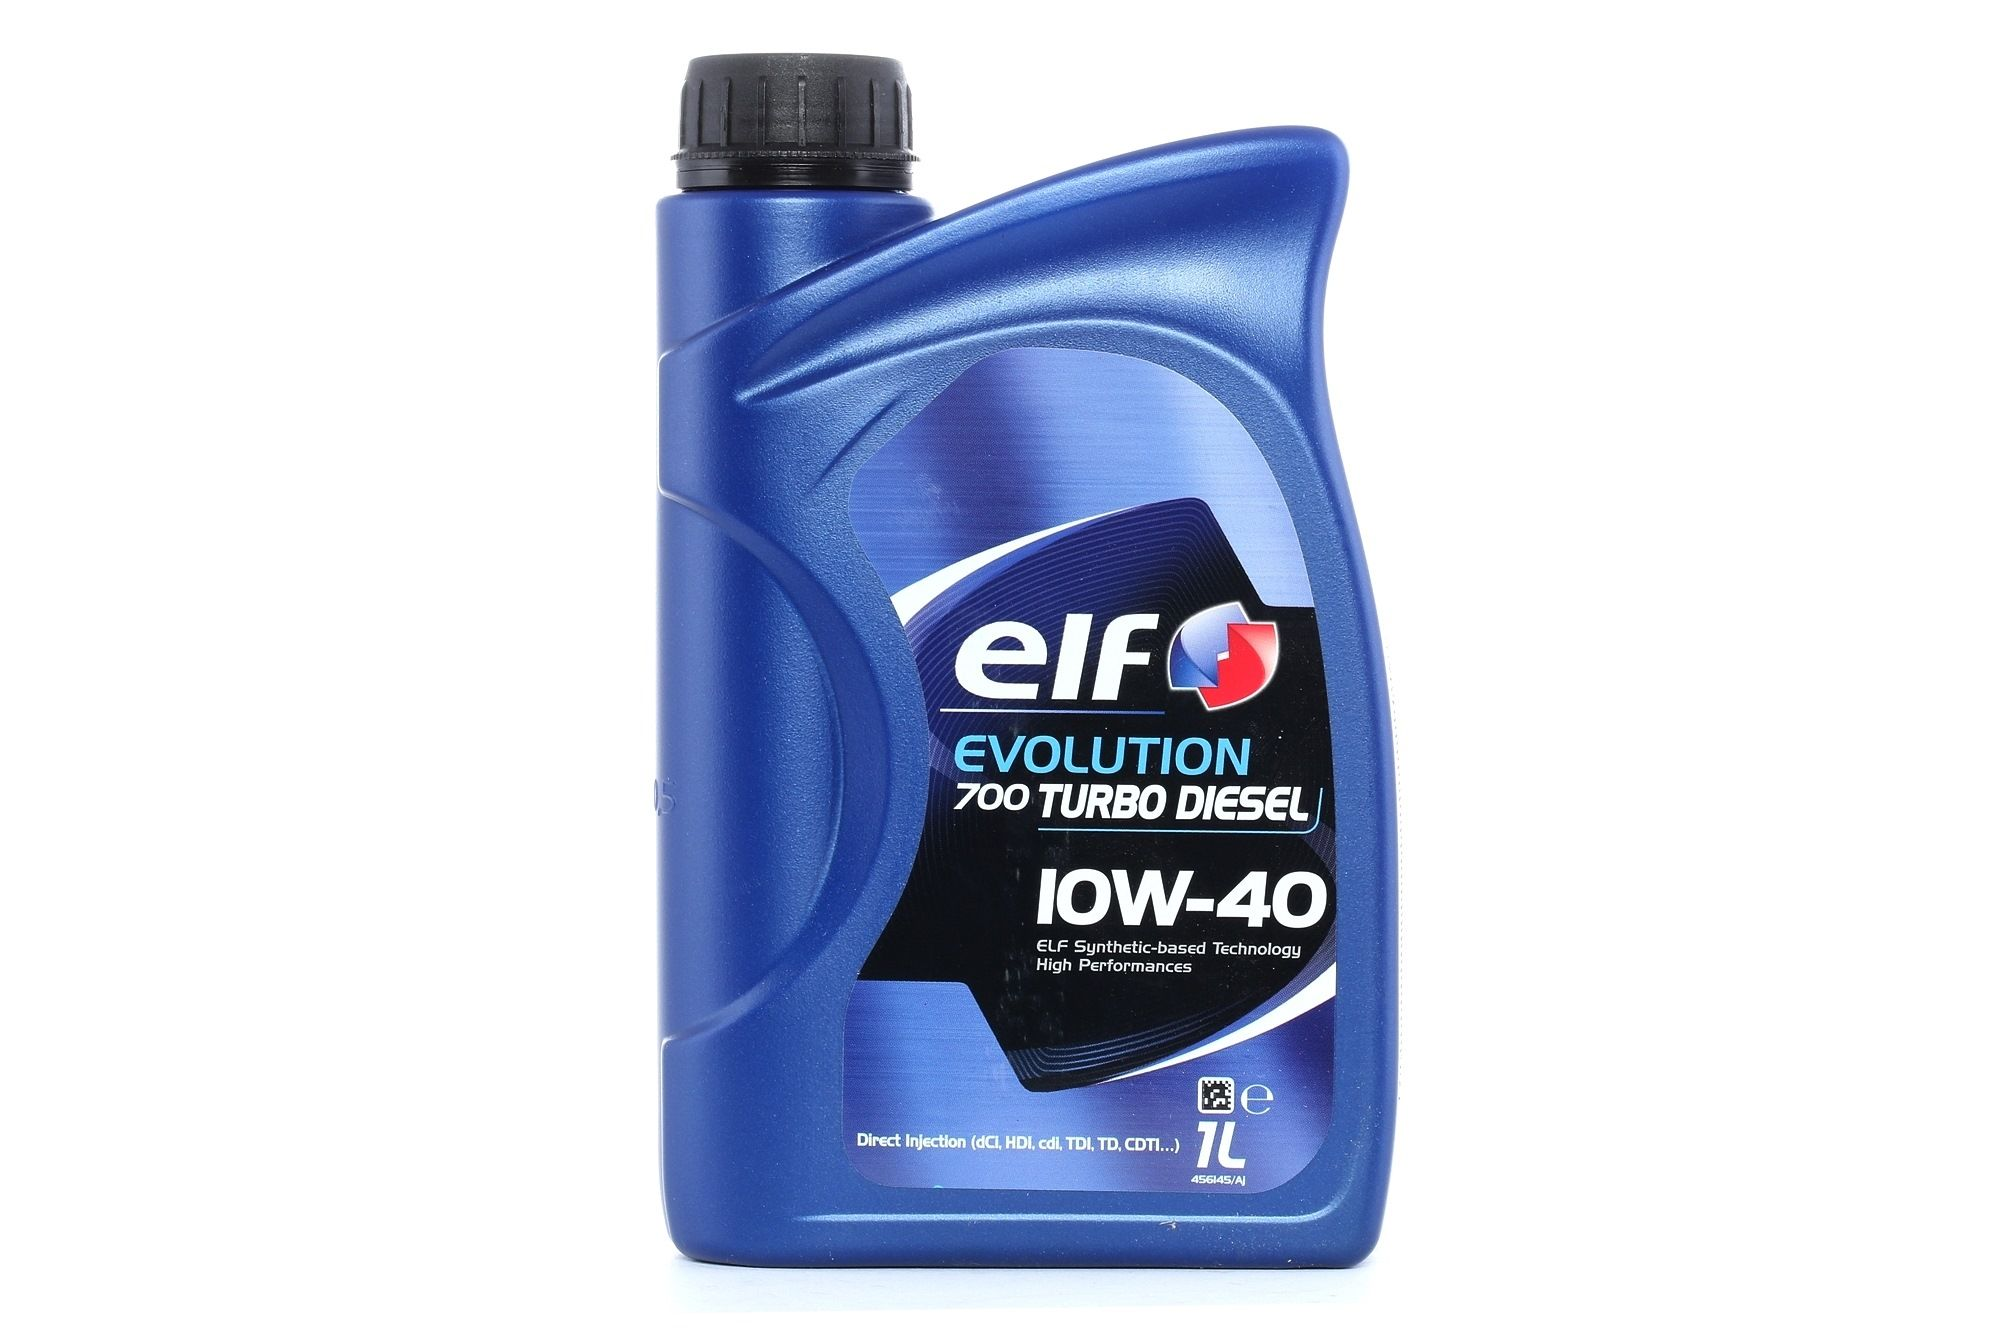 0501CA107C27466841 ELF Evolution, 700 Turbo Diesel 10W-40, 1l, Teilsynthetiköl Motoröl 2201558 günstig kaufen